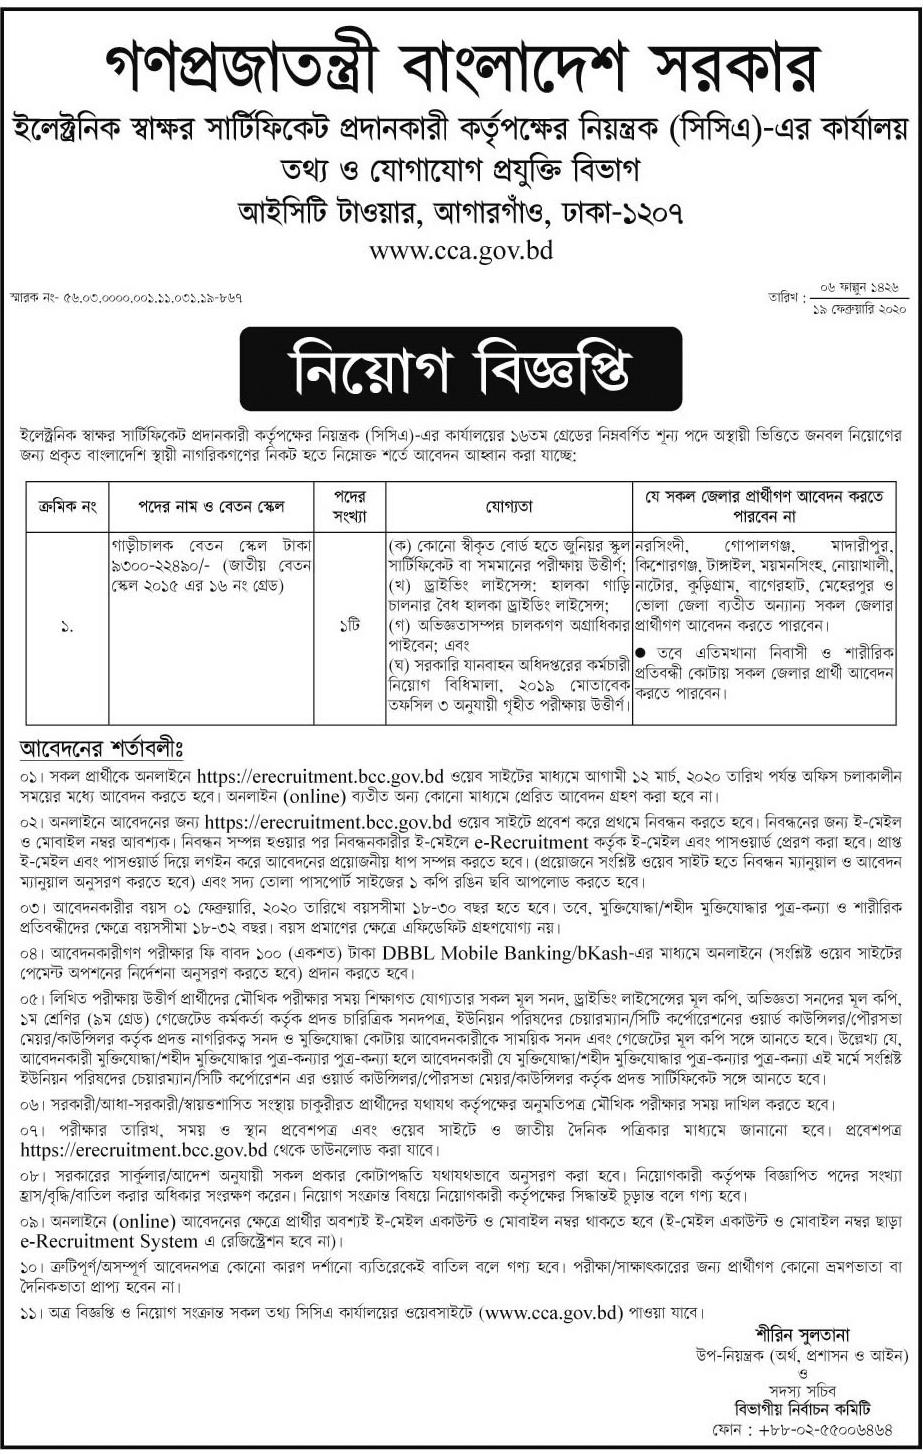 ICT Division Job Circular 2020